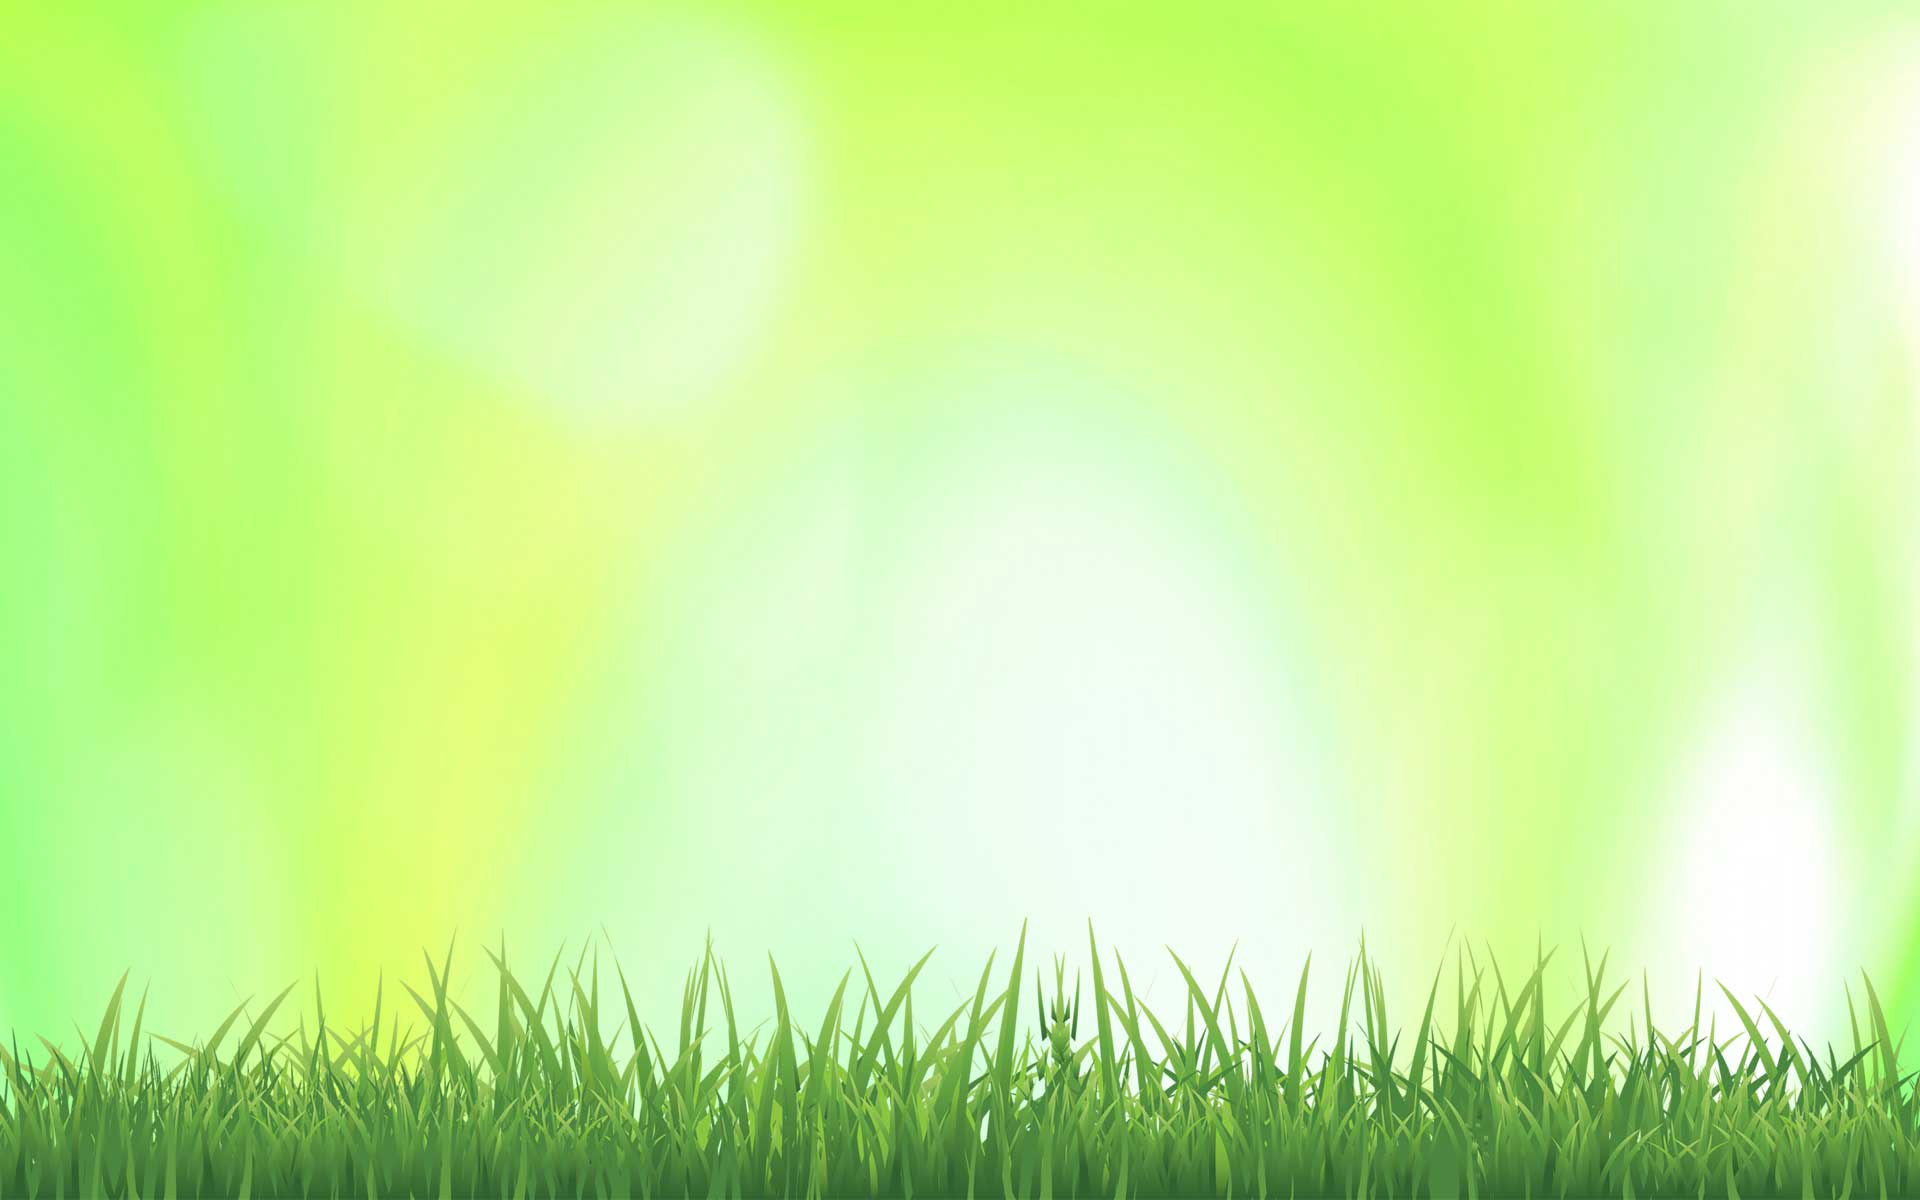 Summer Grass Background